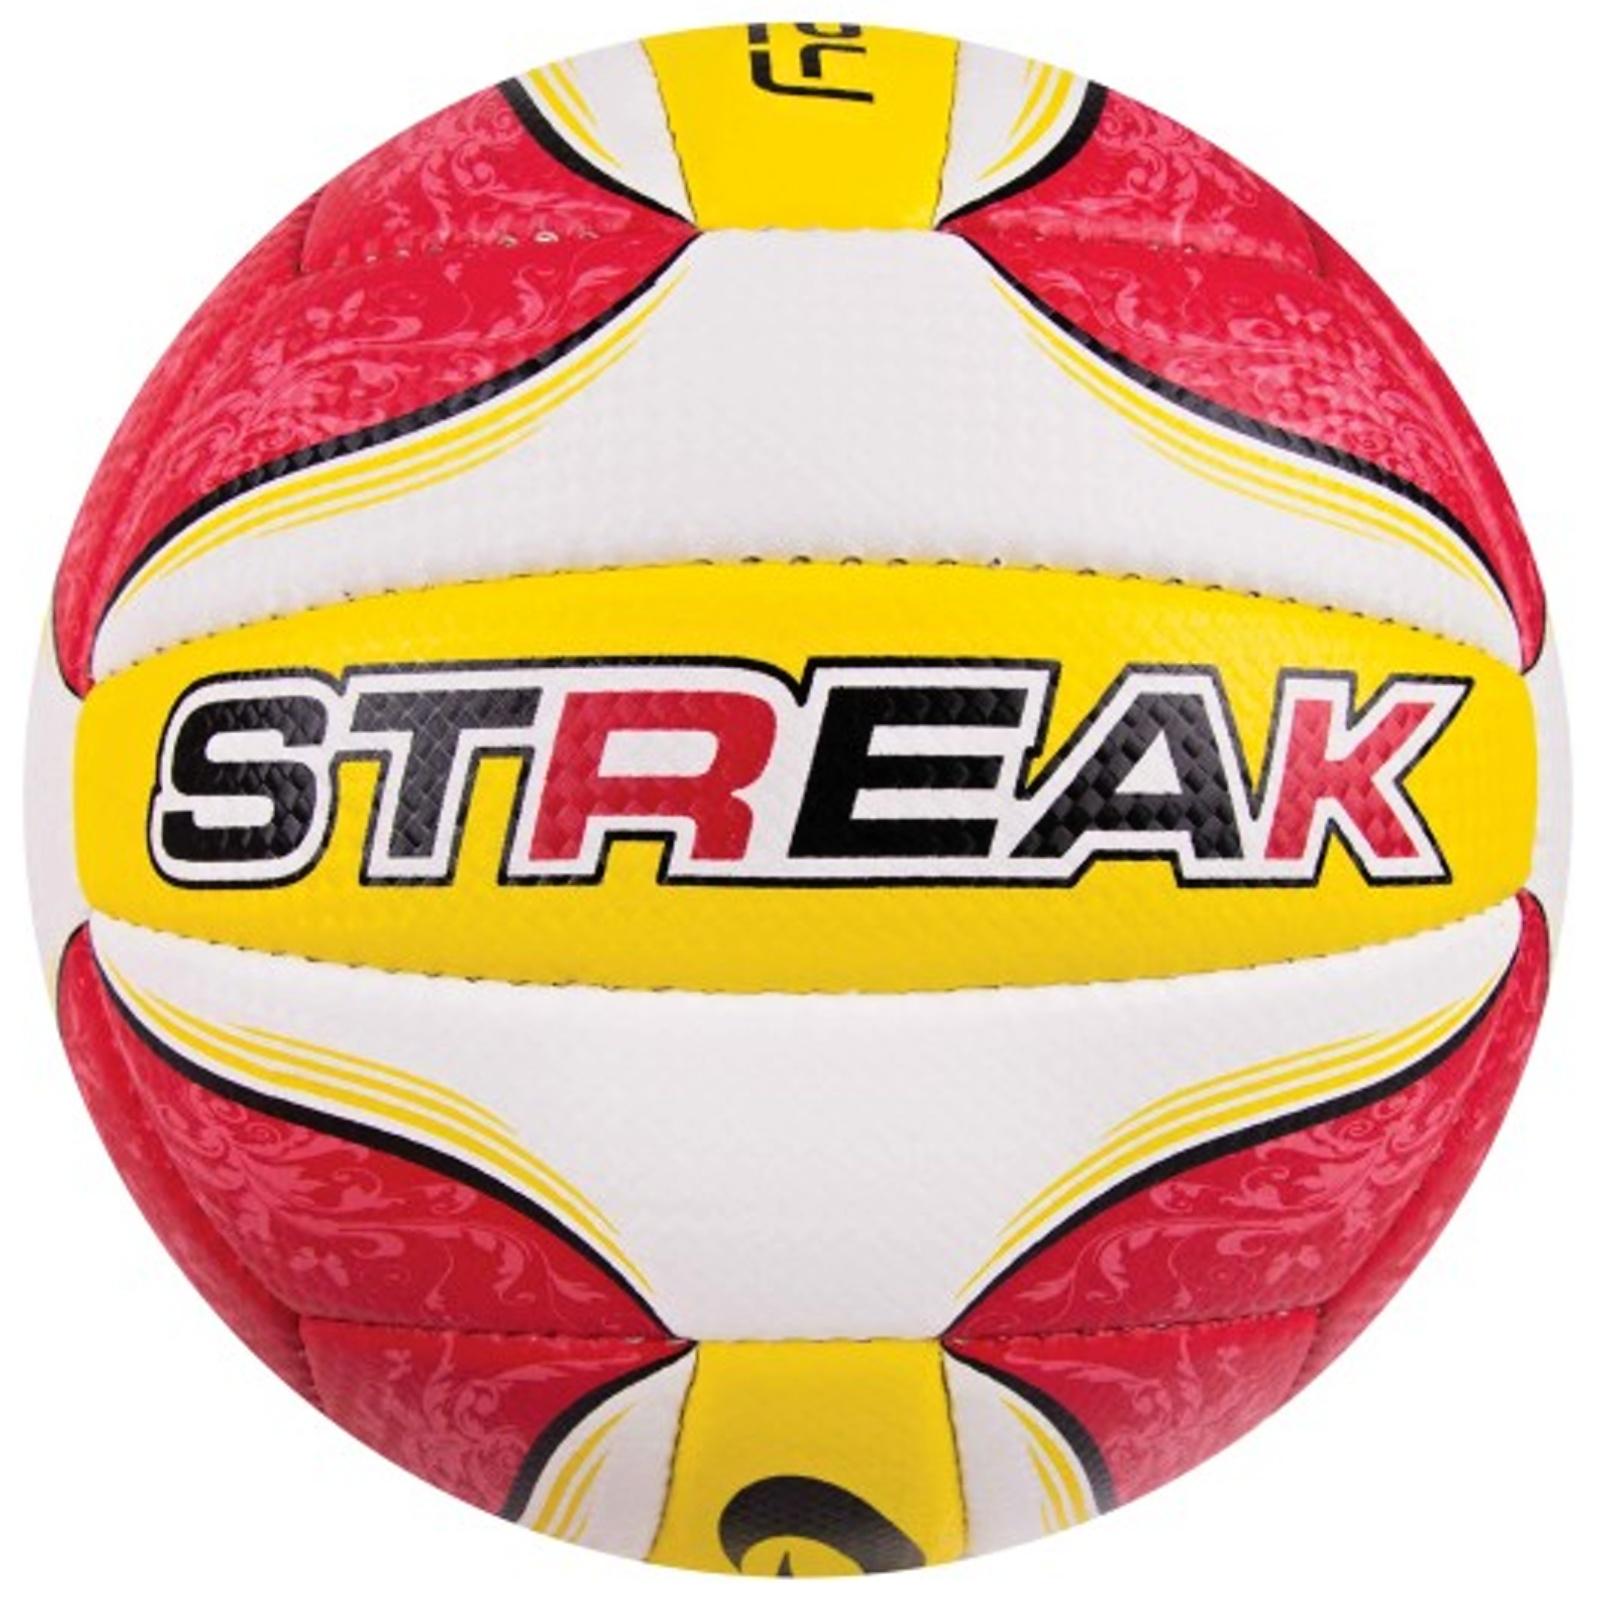 Volejbalový míč SPOKEY Streak II červený